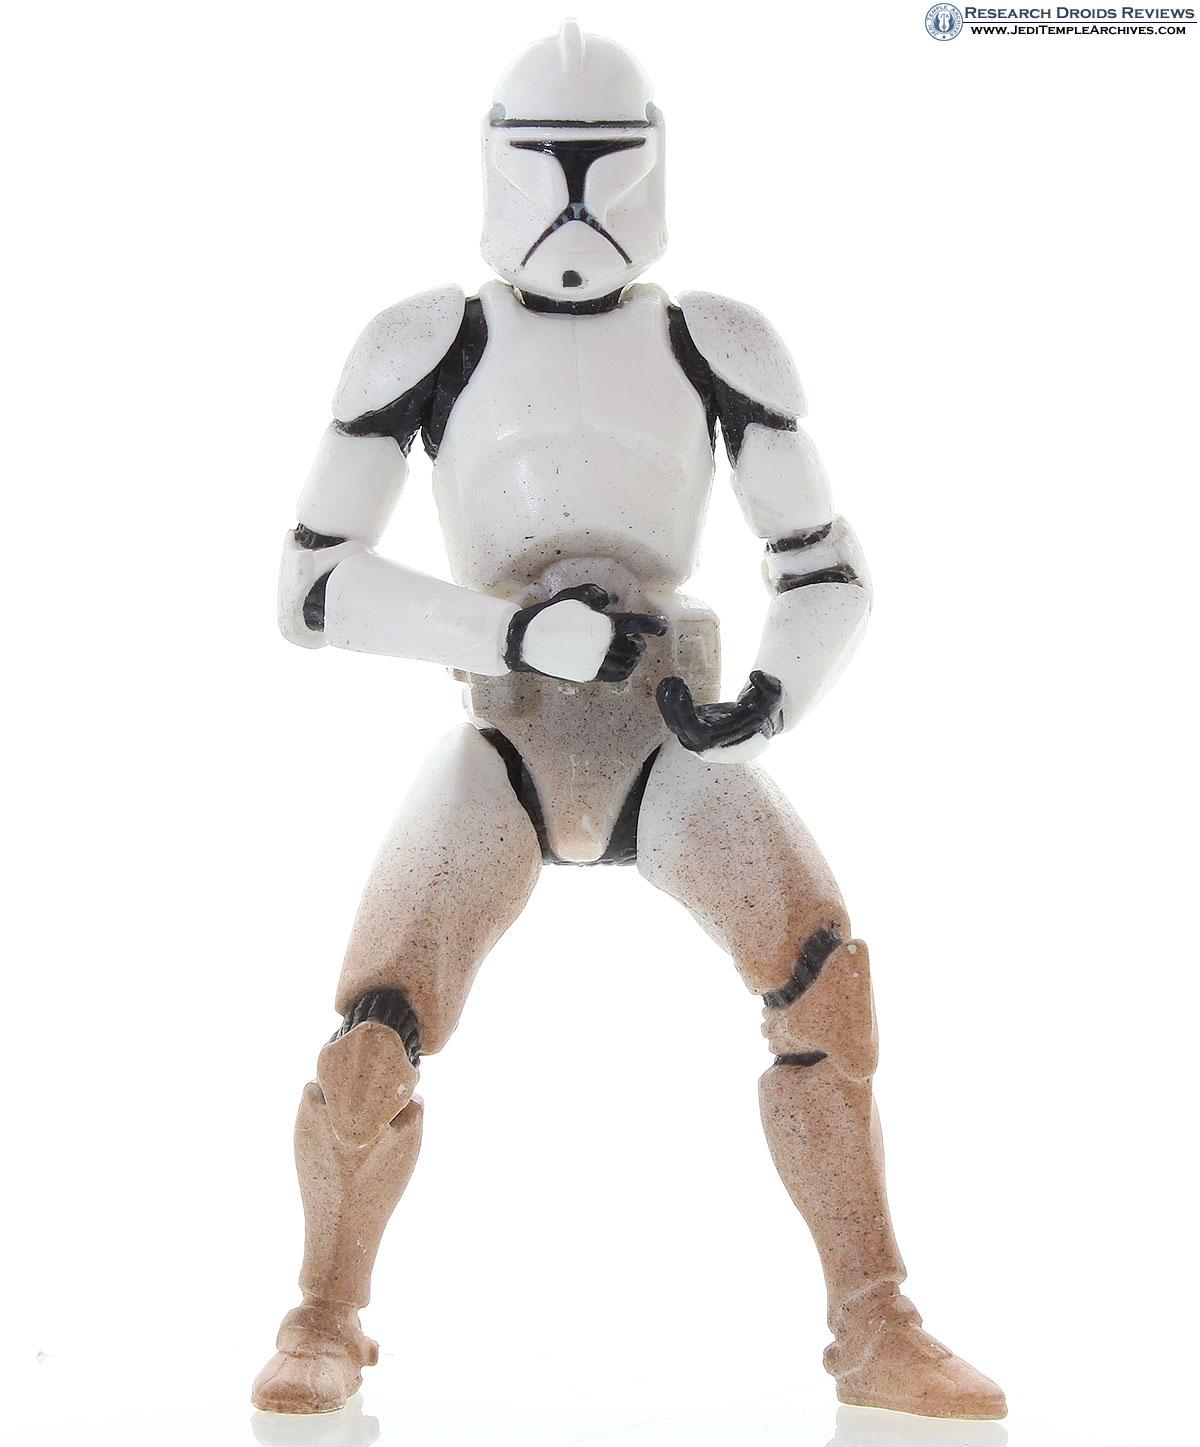 Clone Trooper Sneak Preview